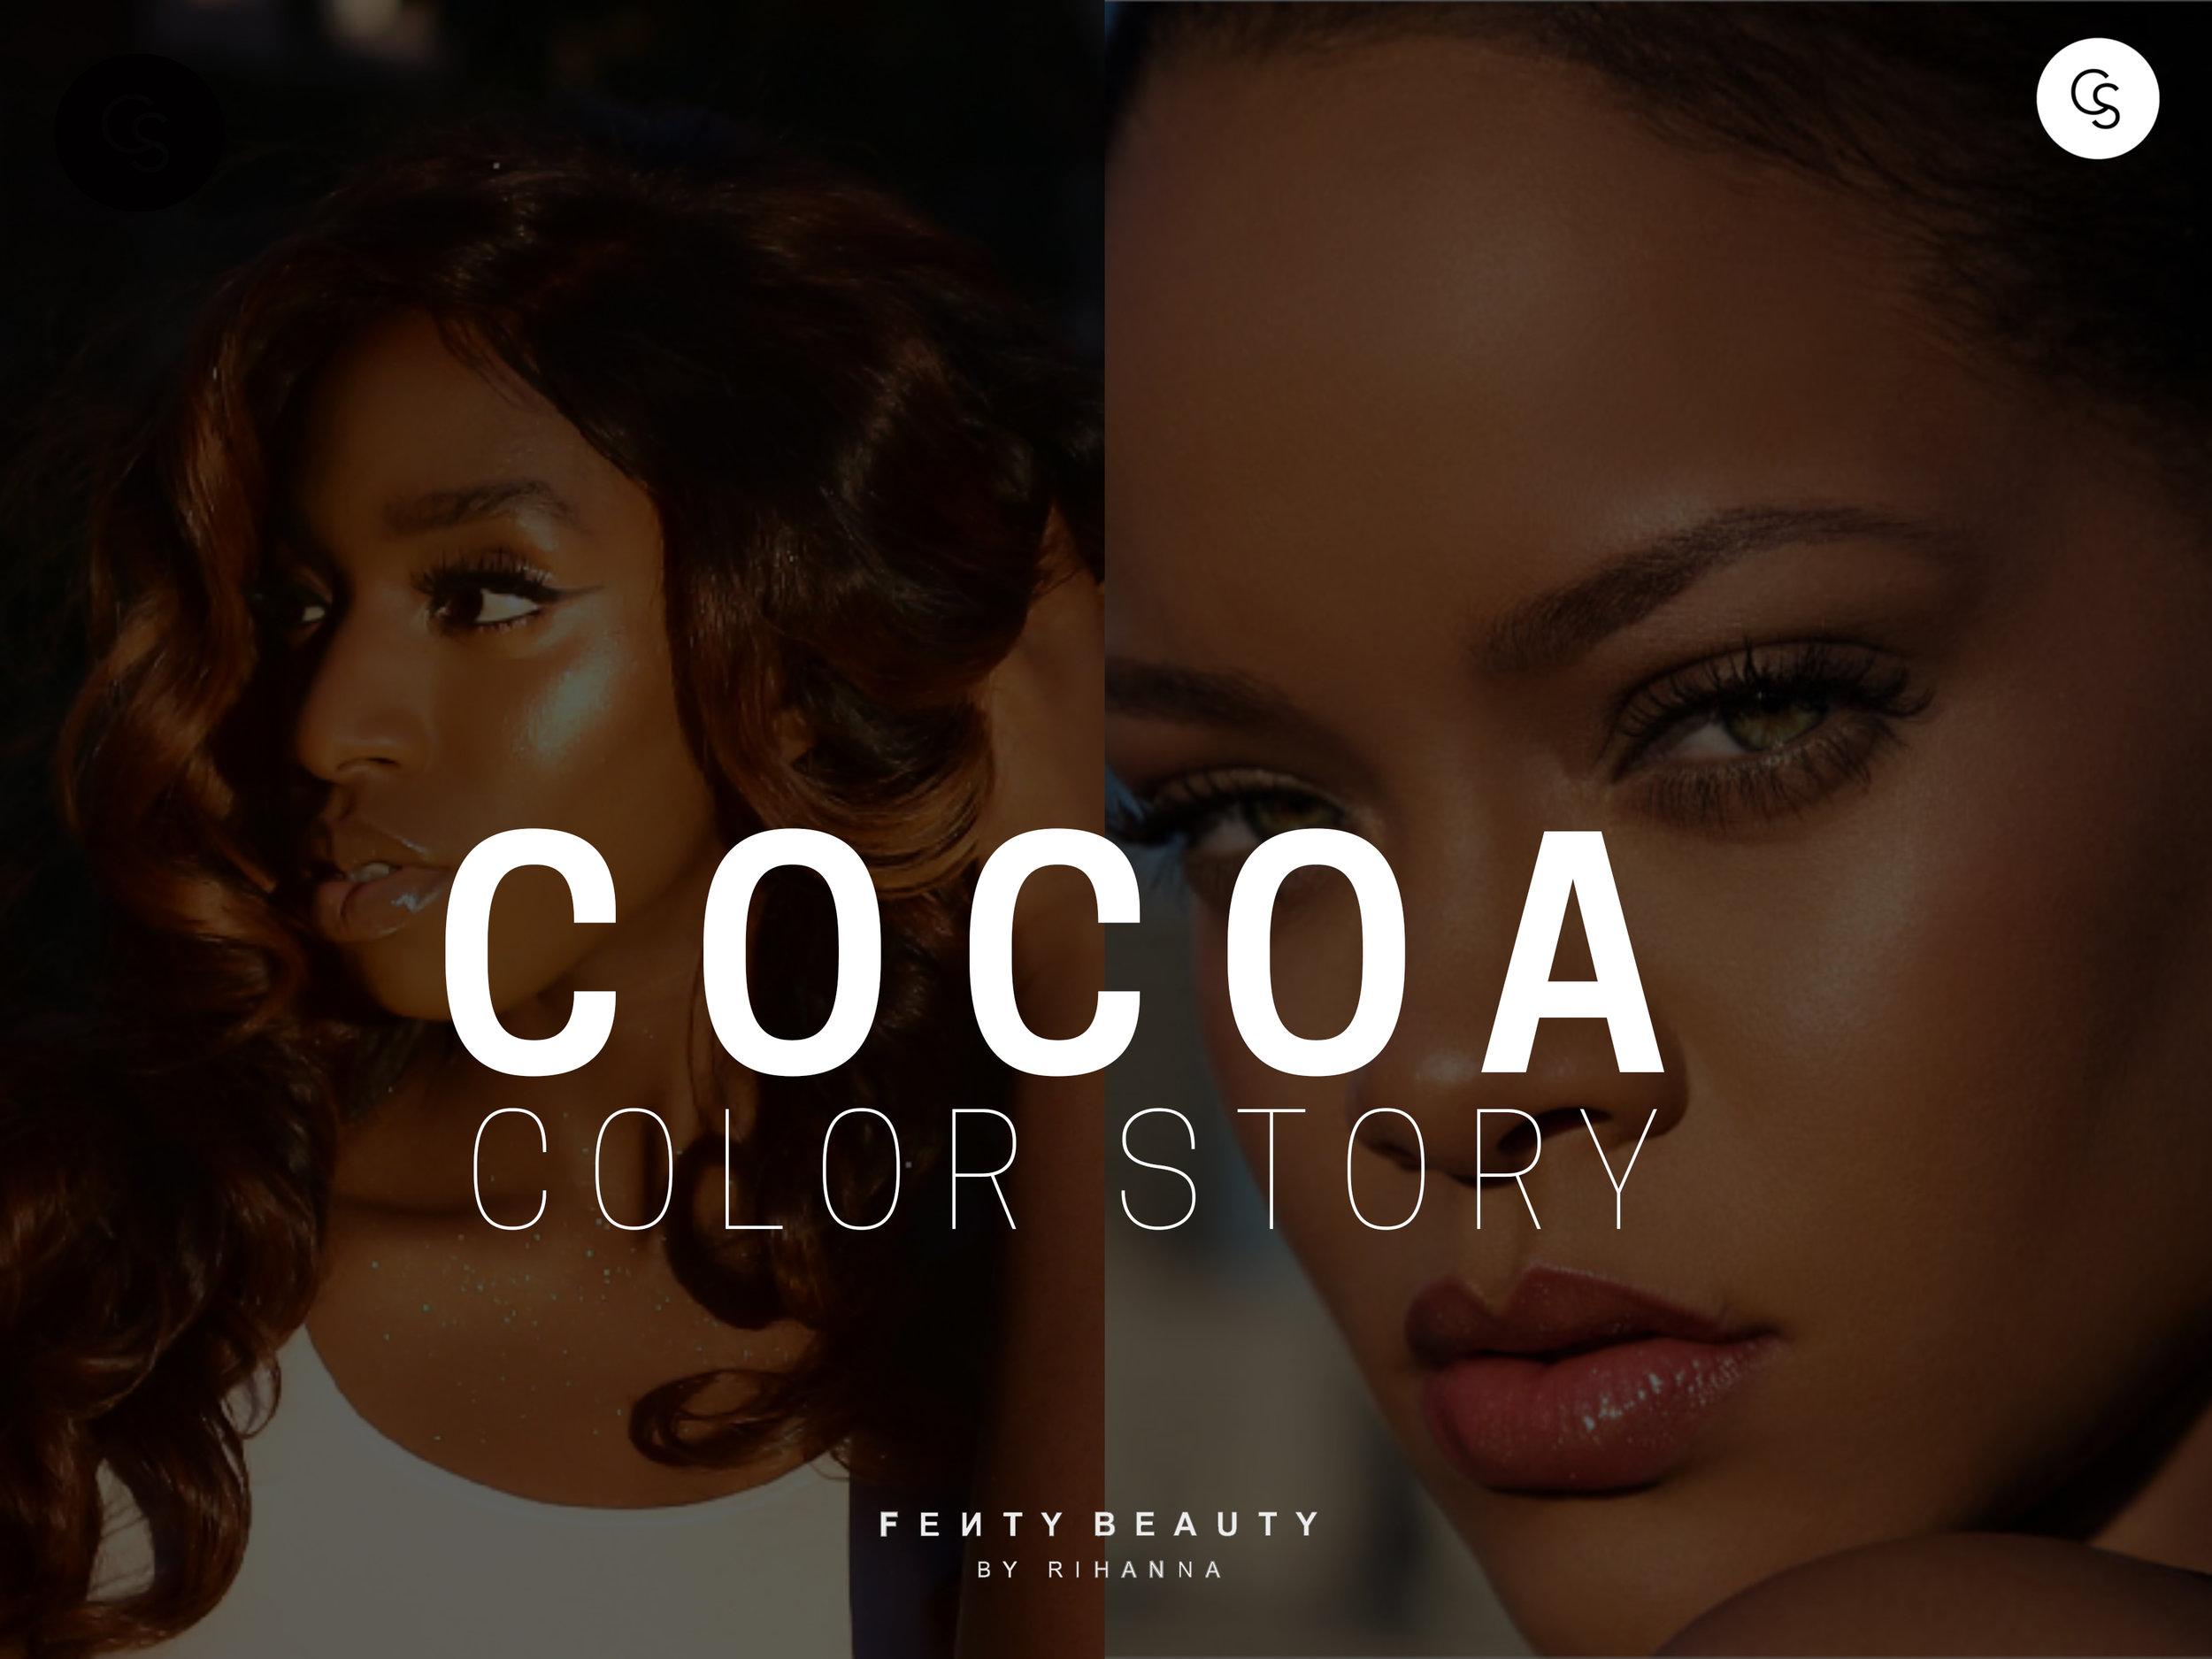 FENTY-colorstory2.jpg